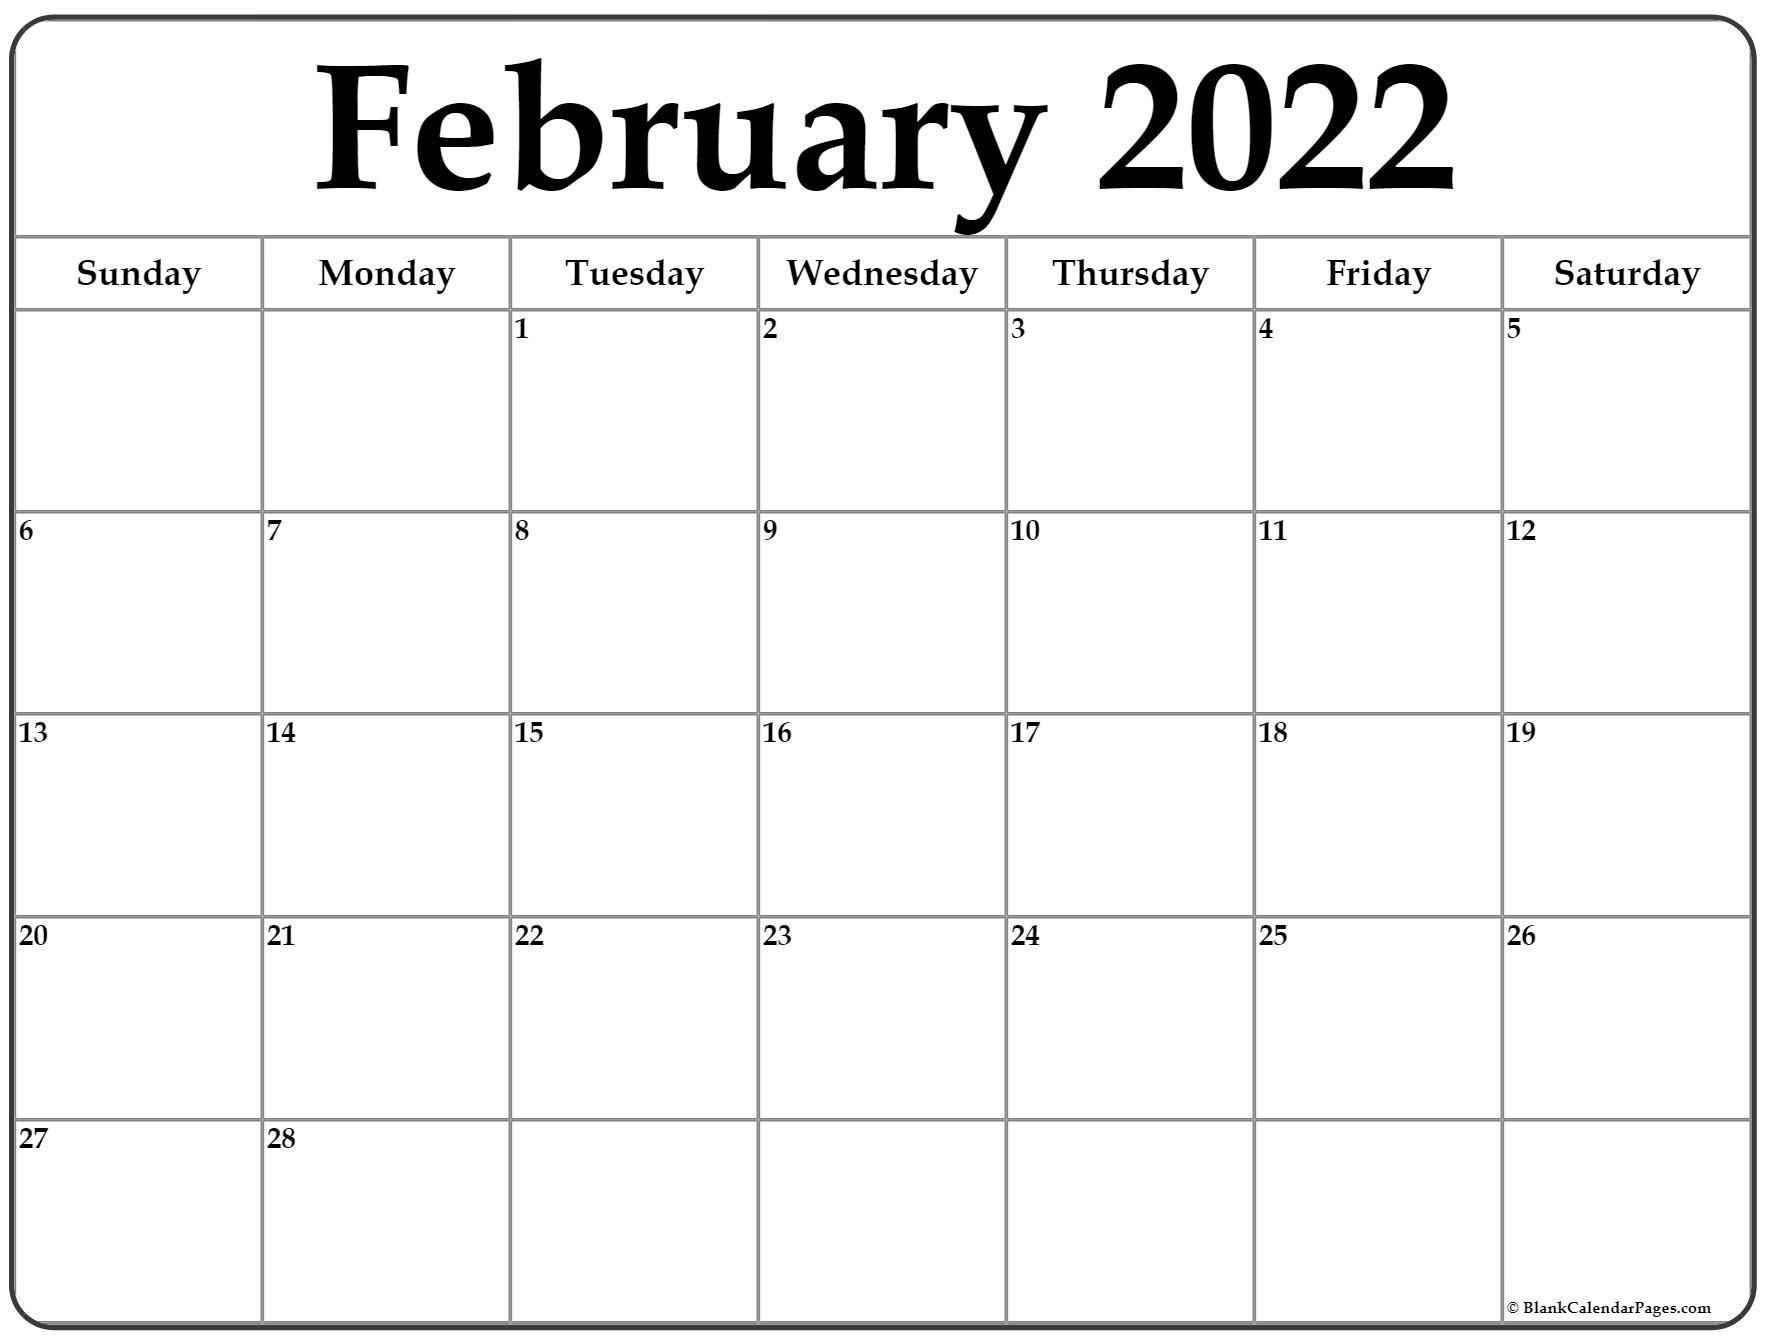 February 2022 Calendar | Free Printable Calendar Templates Within Fillable February 2022 Calendar